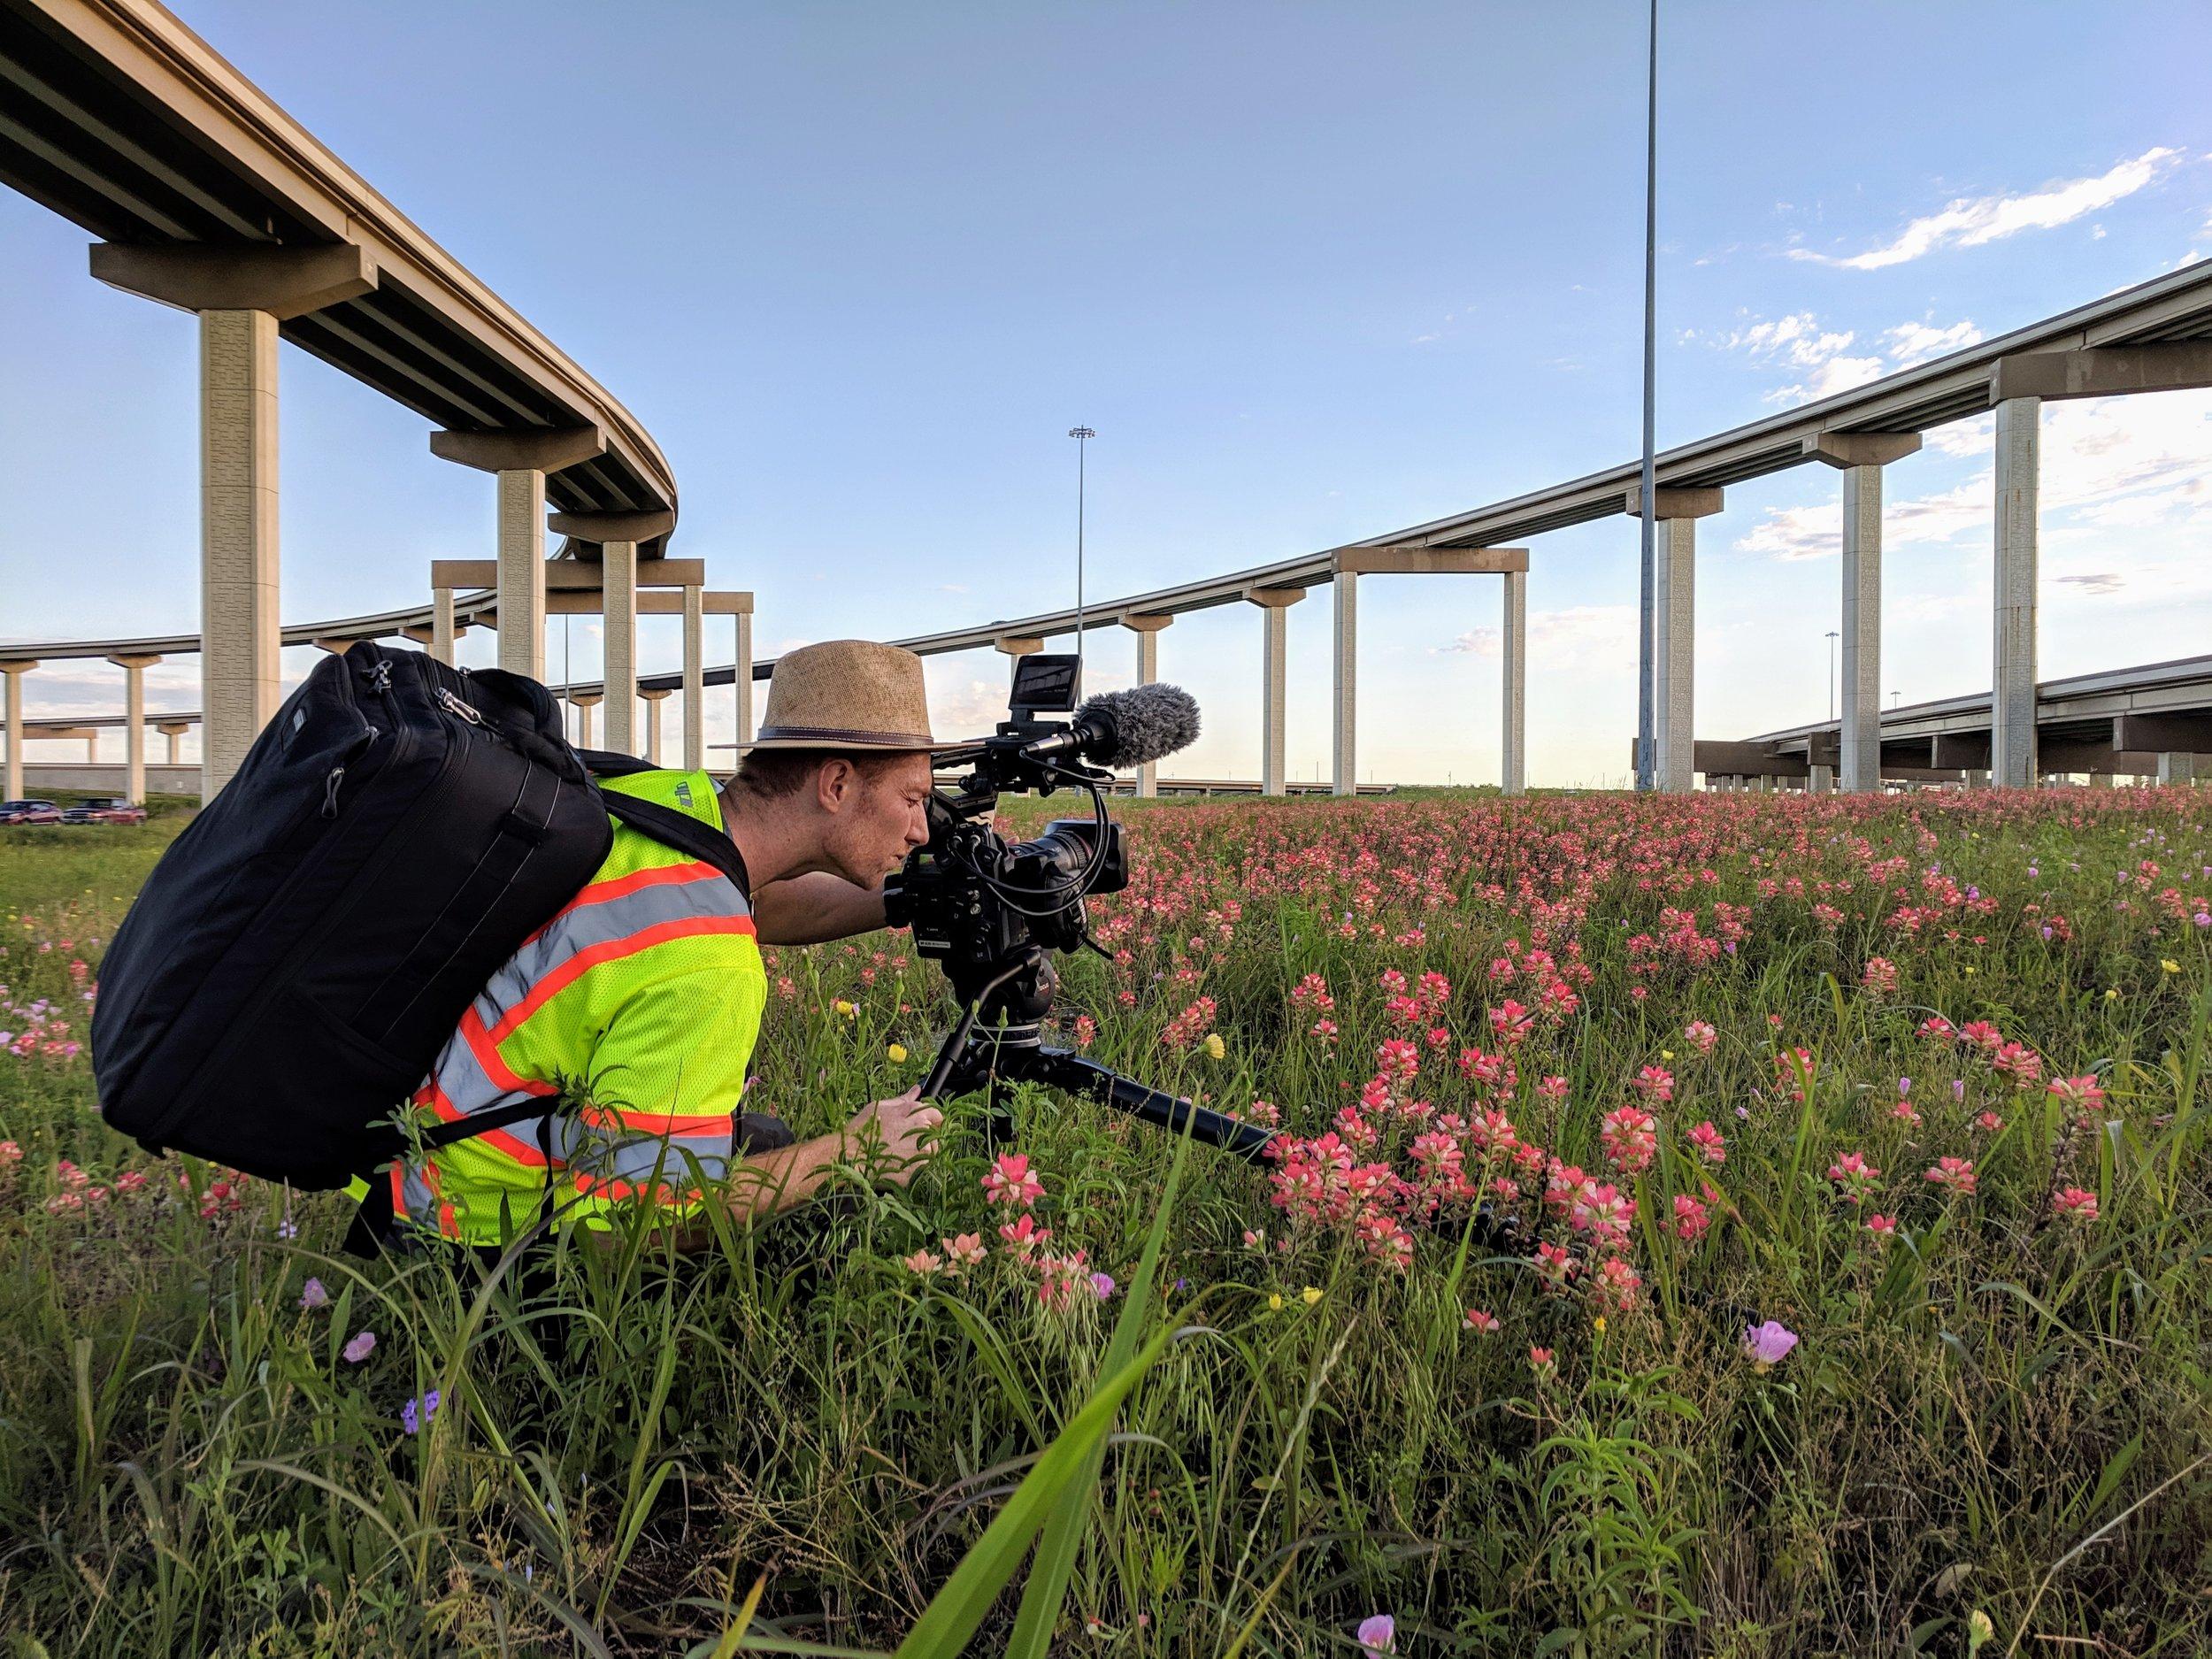 Texas Highway 130